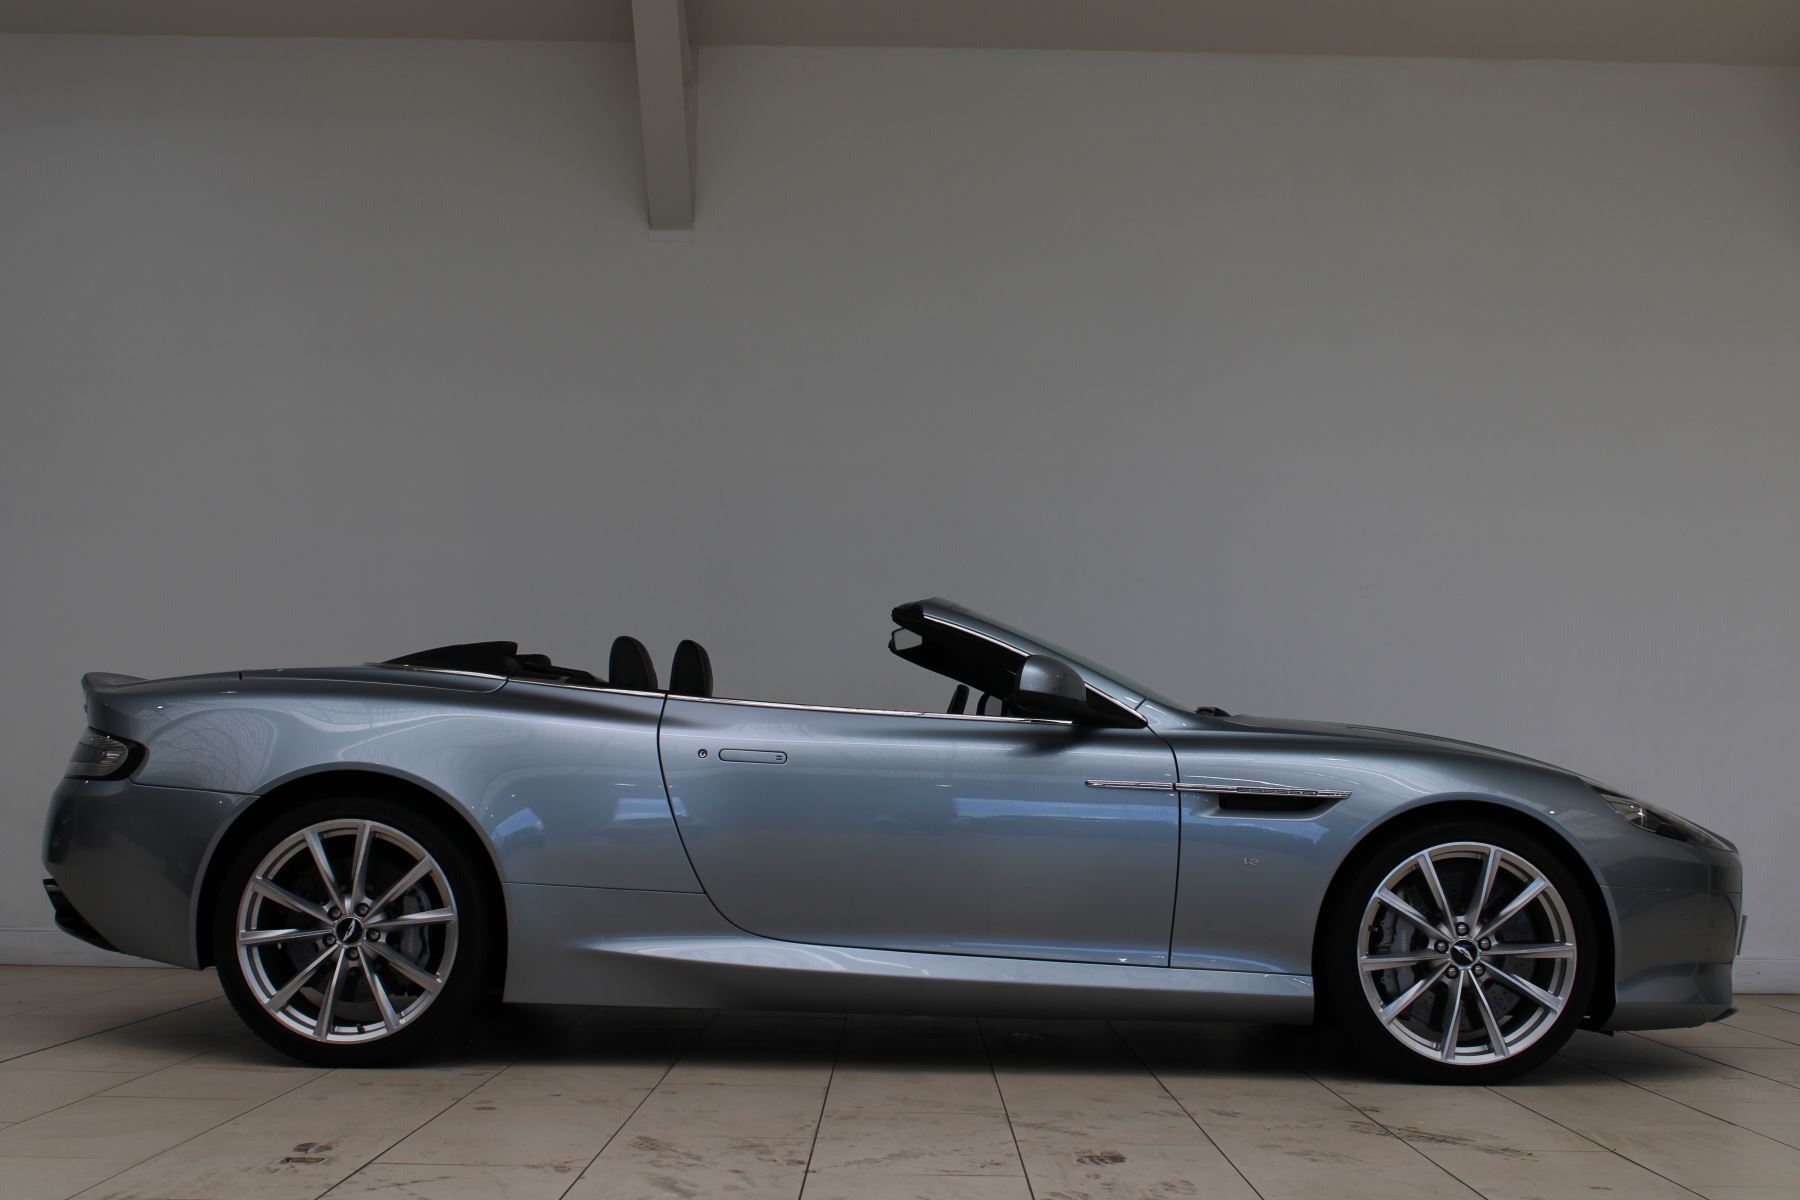 Aston Martin DB9 V12 GT 2dr Volante Skyfall Silver image 2